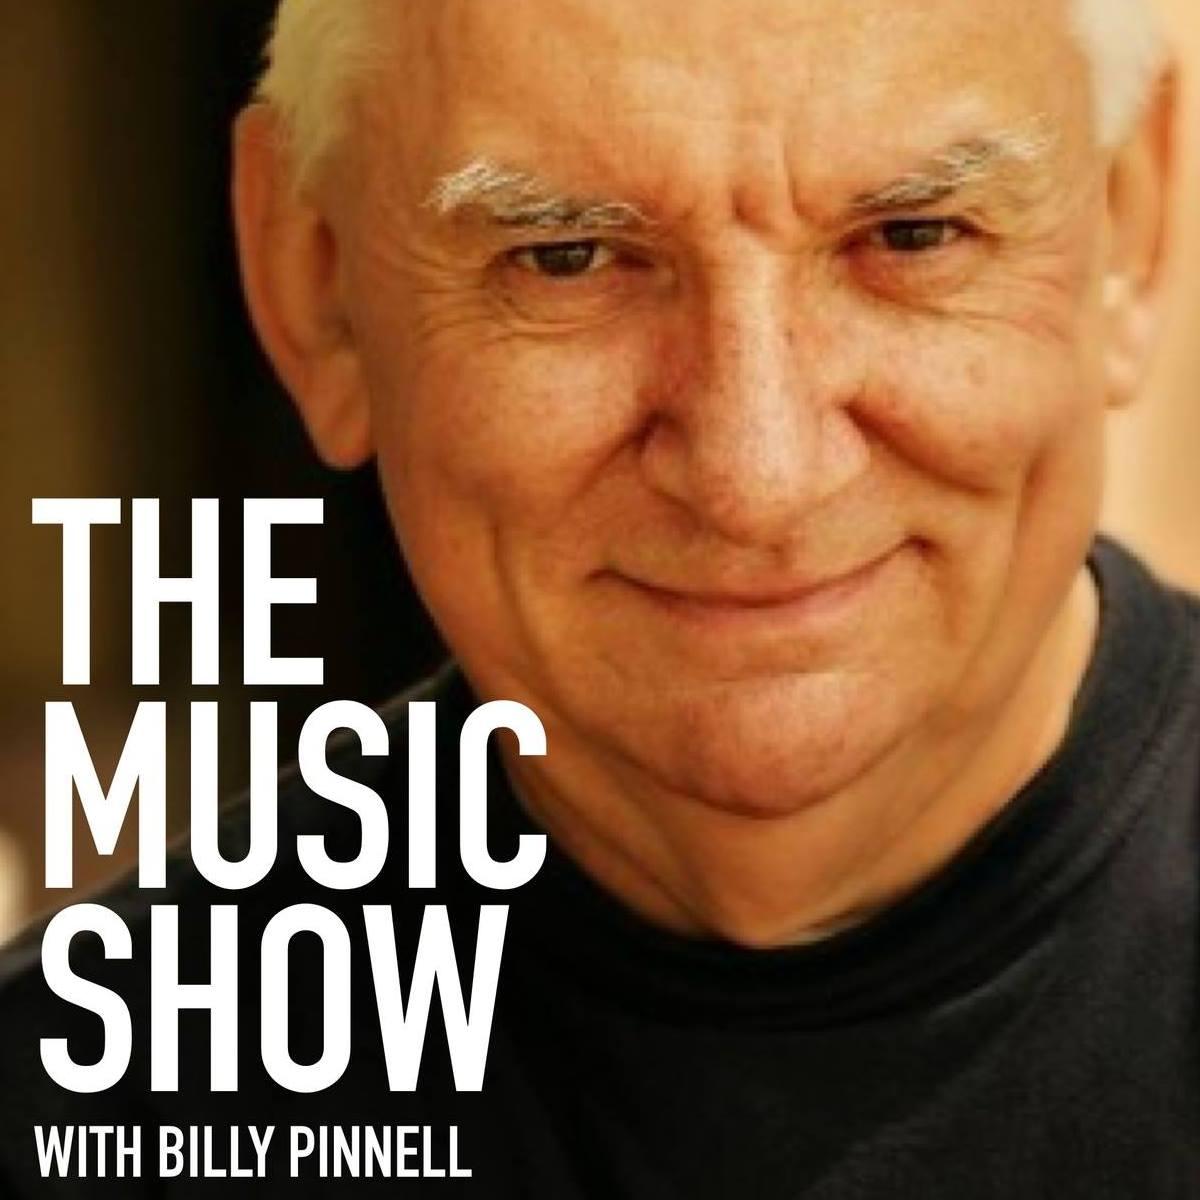 Billy-Pinnell-Music-Show.jpg